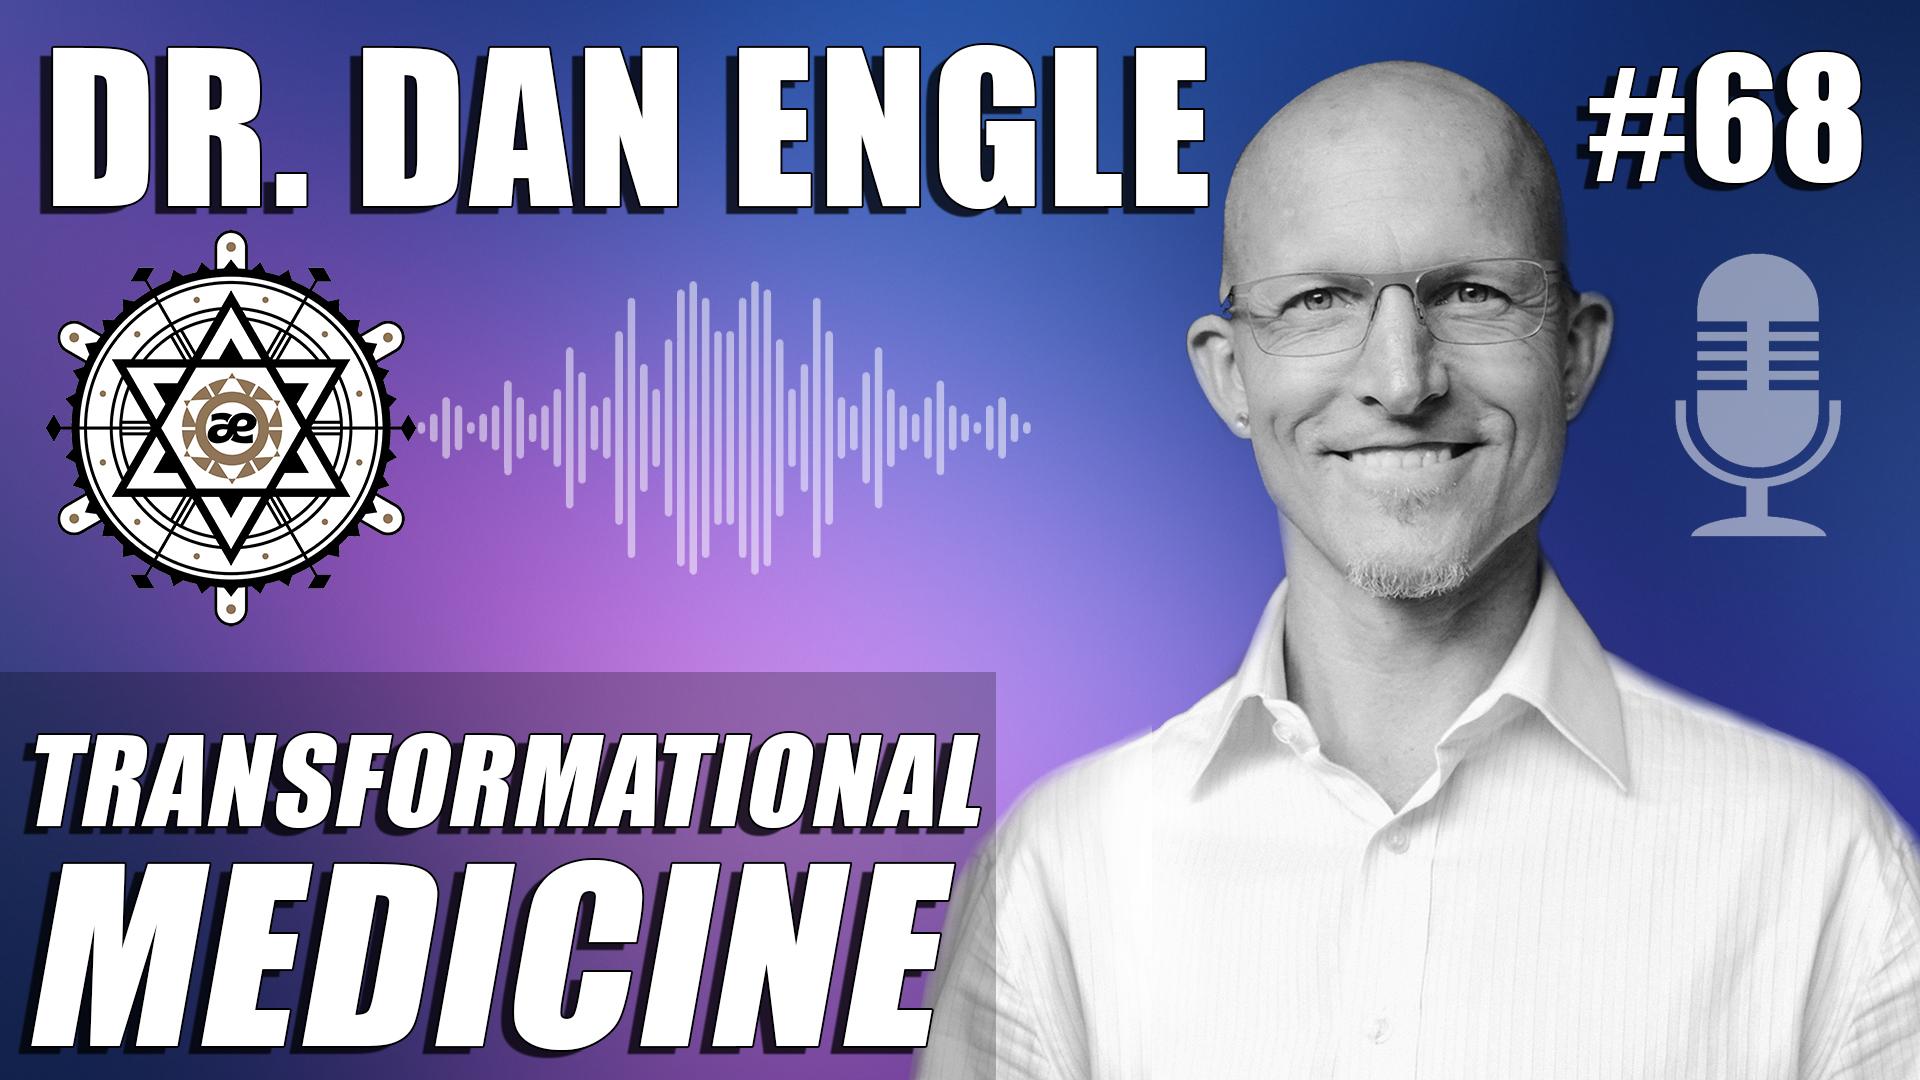 EP68 Dr. Dan Engle - Transformational Medicine